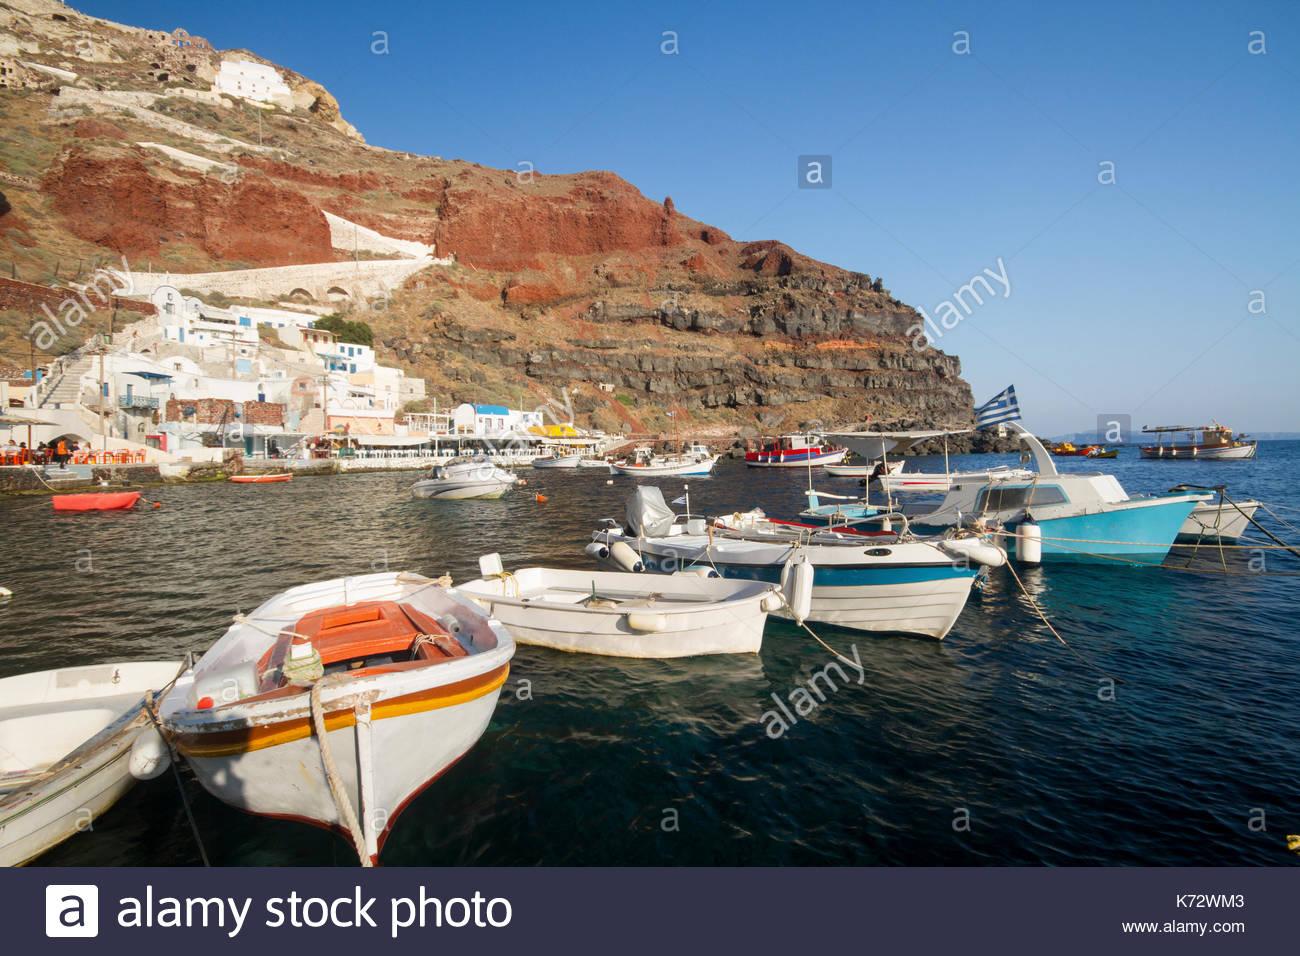 Amoudi Villas Ammoudi Harbour Stock Photos Ammoudi Harbour Stock Images Alamy